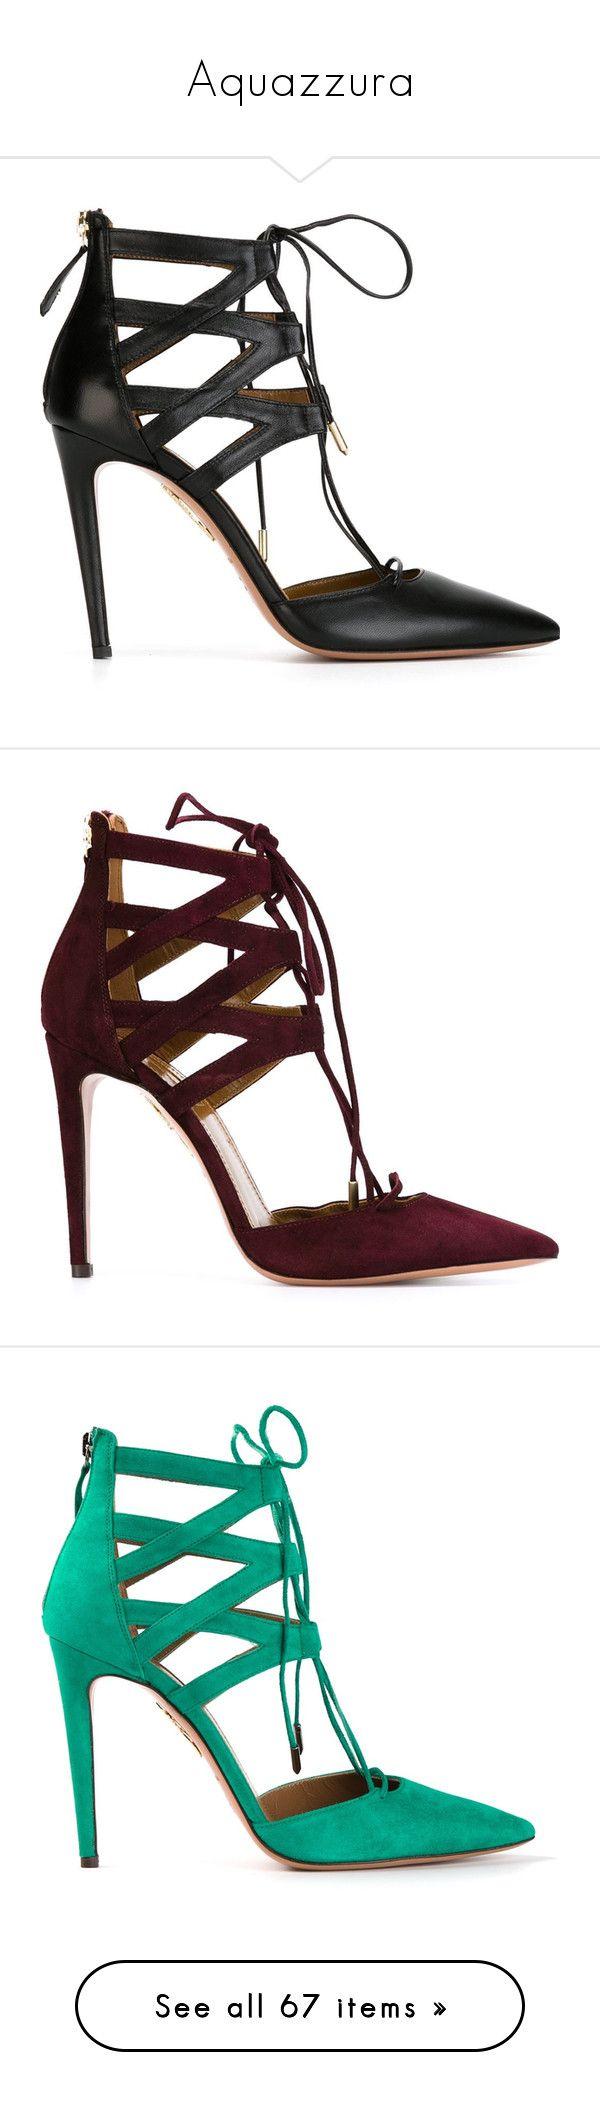 """Aquazzura"" by katiasitems on Polyvore featuring shoes, pumps, heels, aquazzura, saltos, black, black heel pumps, high heel stilettos, lace up stilettos and heels stilettos"